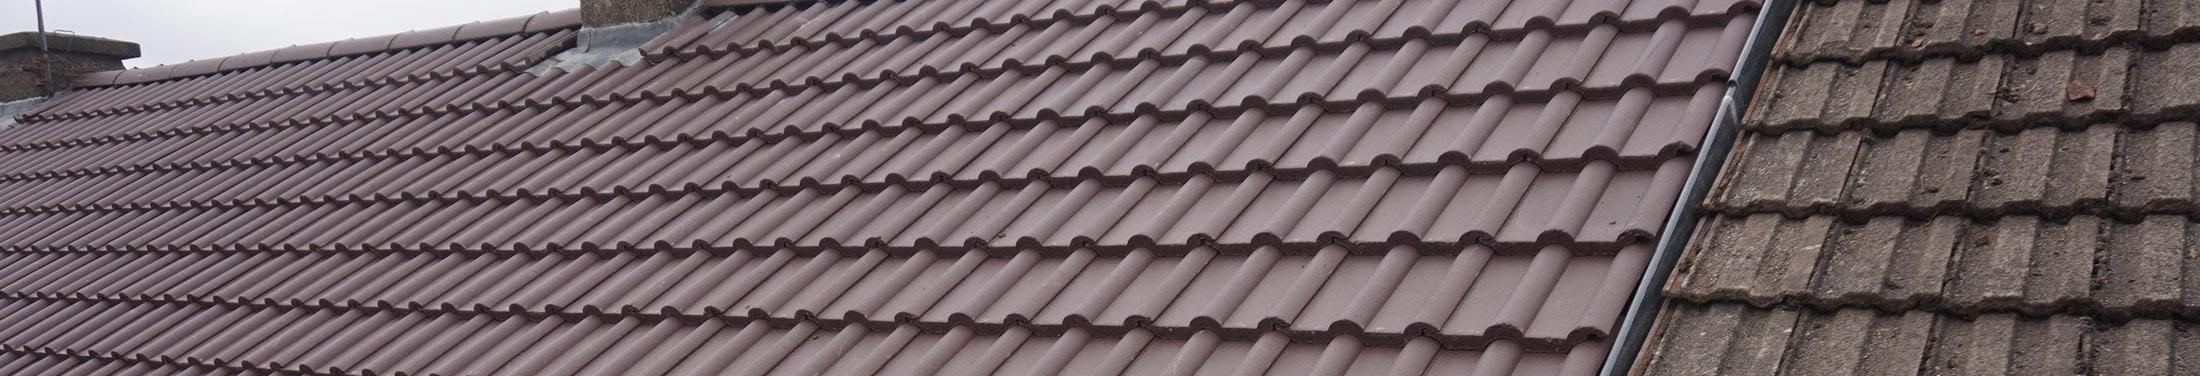 Roofers Coatbridge